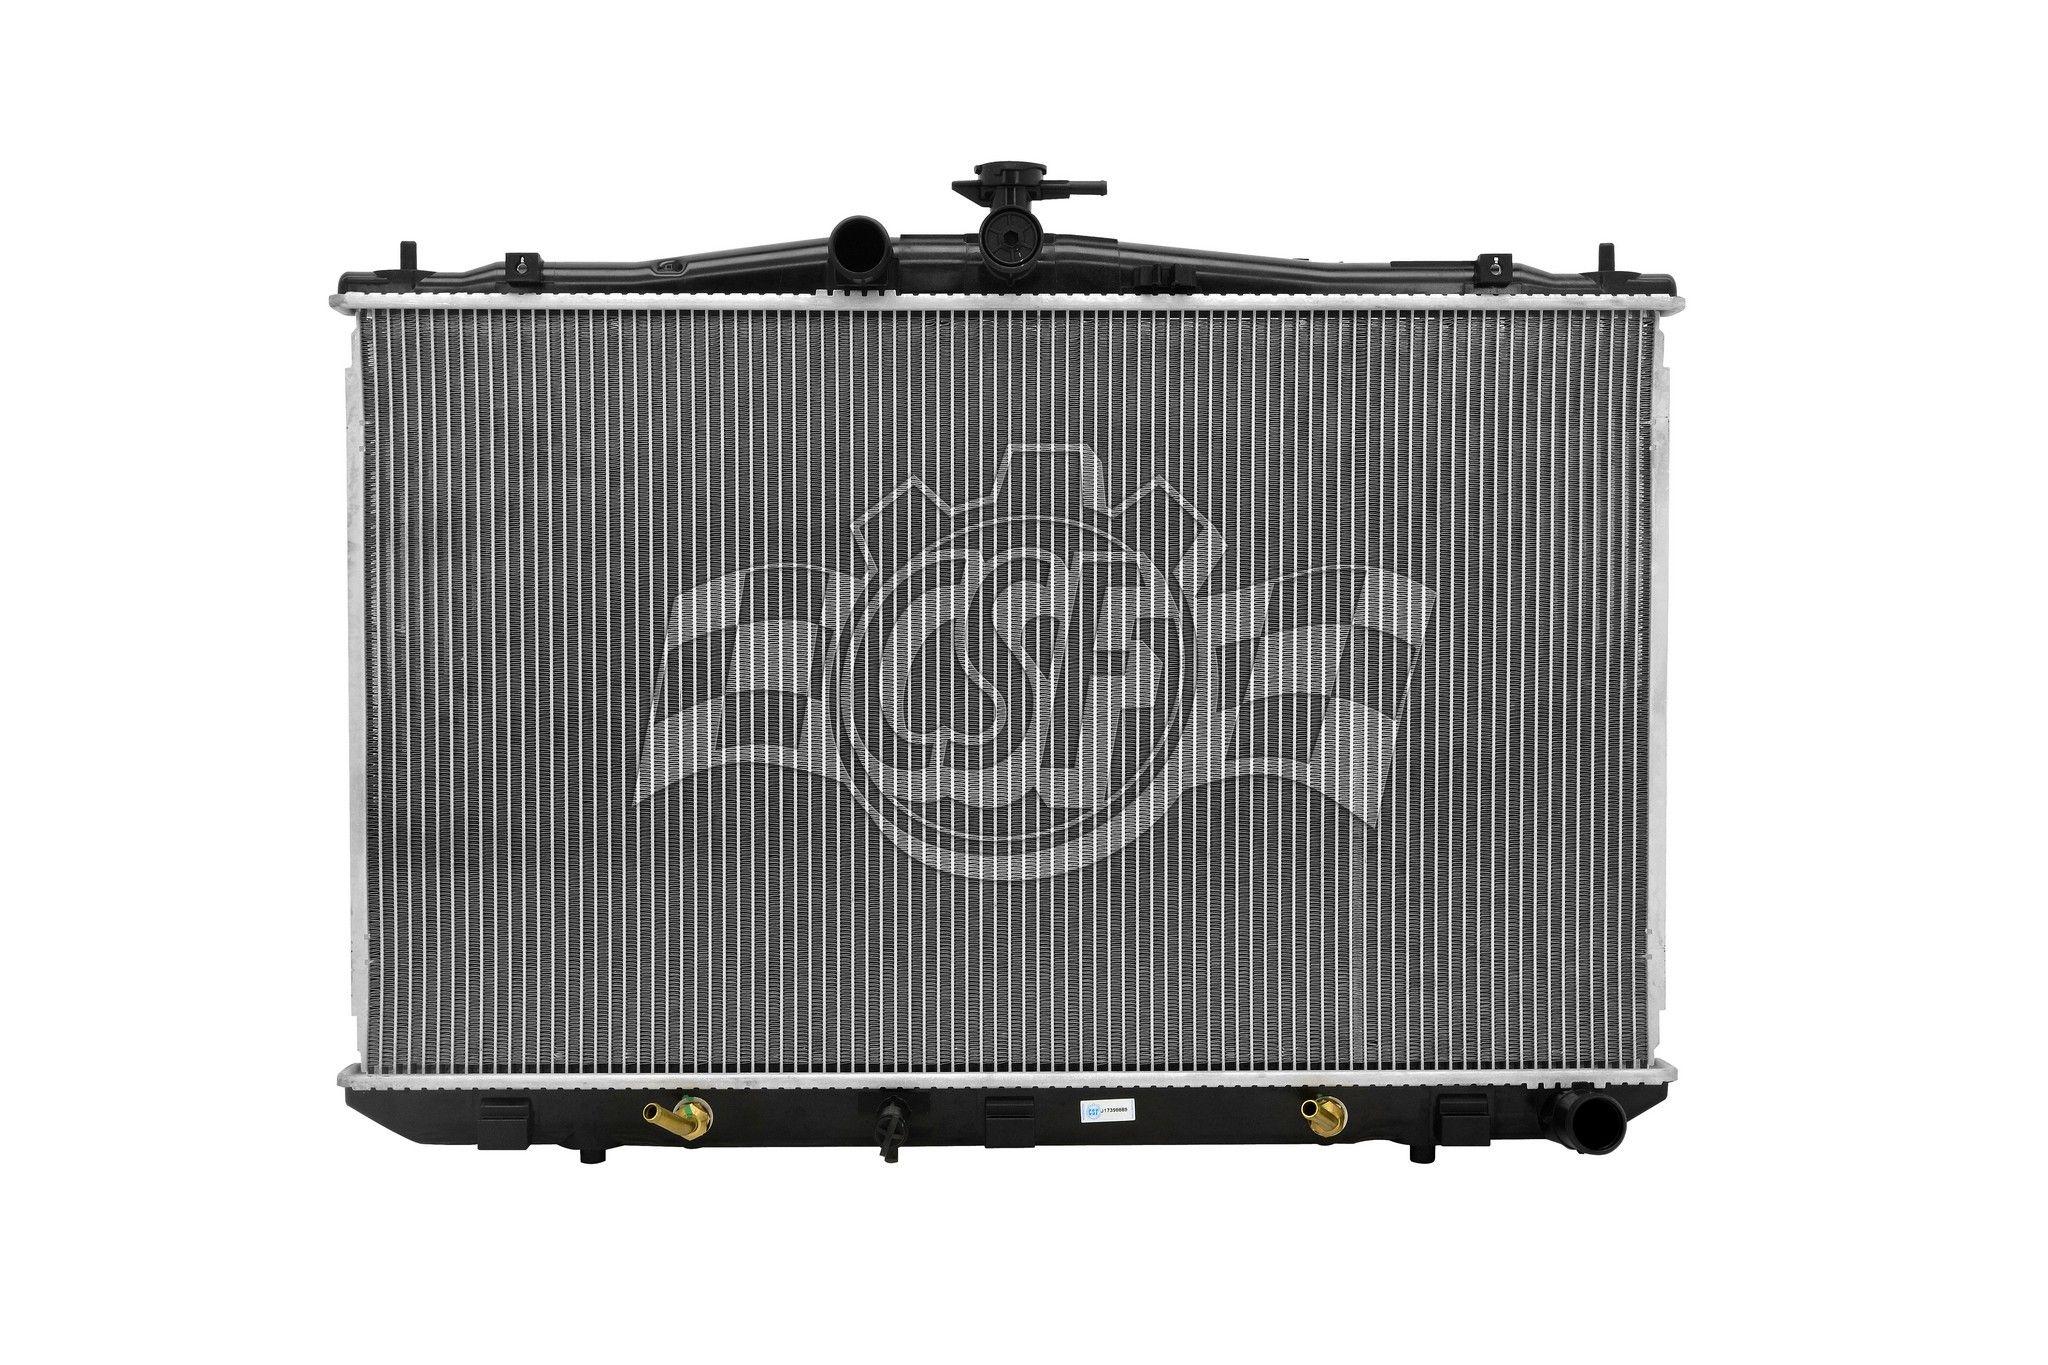 Lexus RX350 Radiator Replacement (APDI, CSF Radiator, Denso, Global